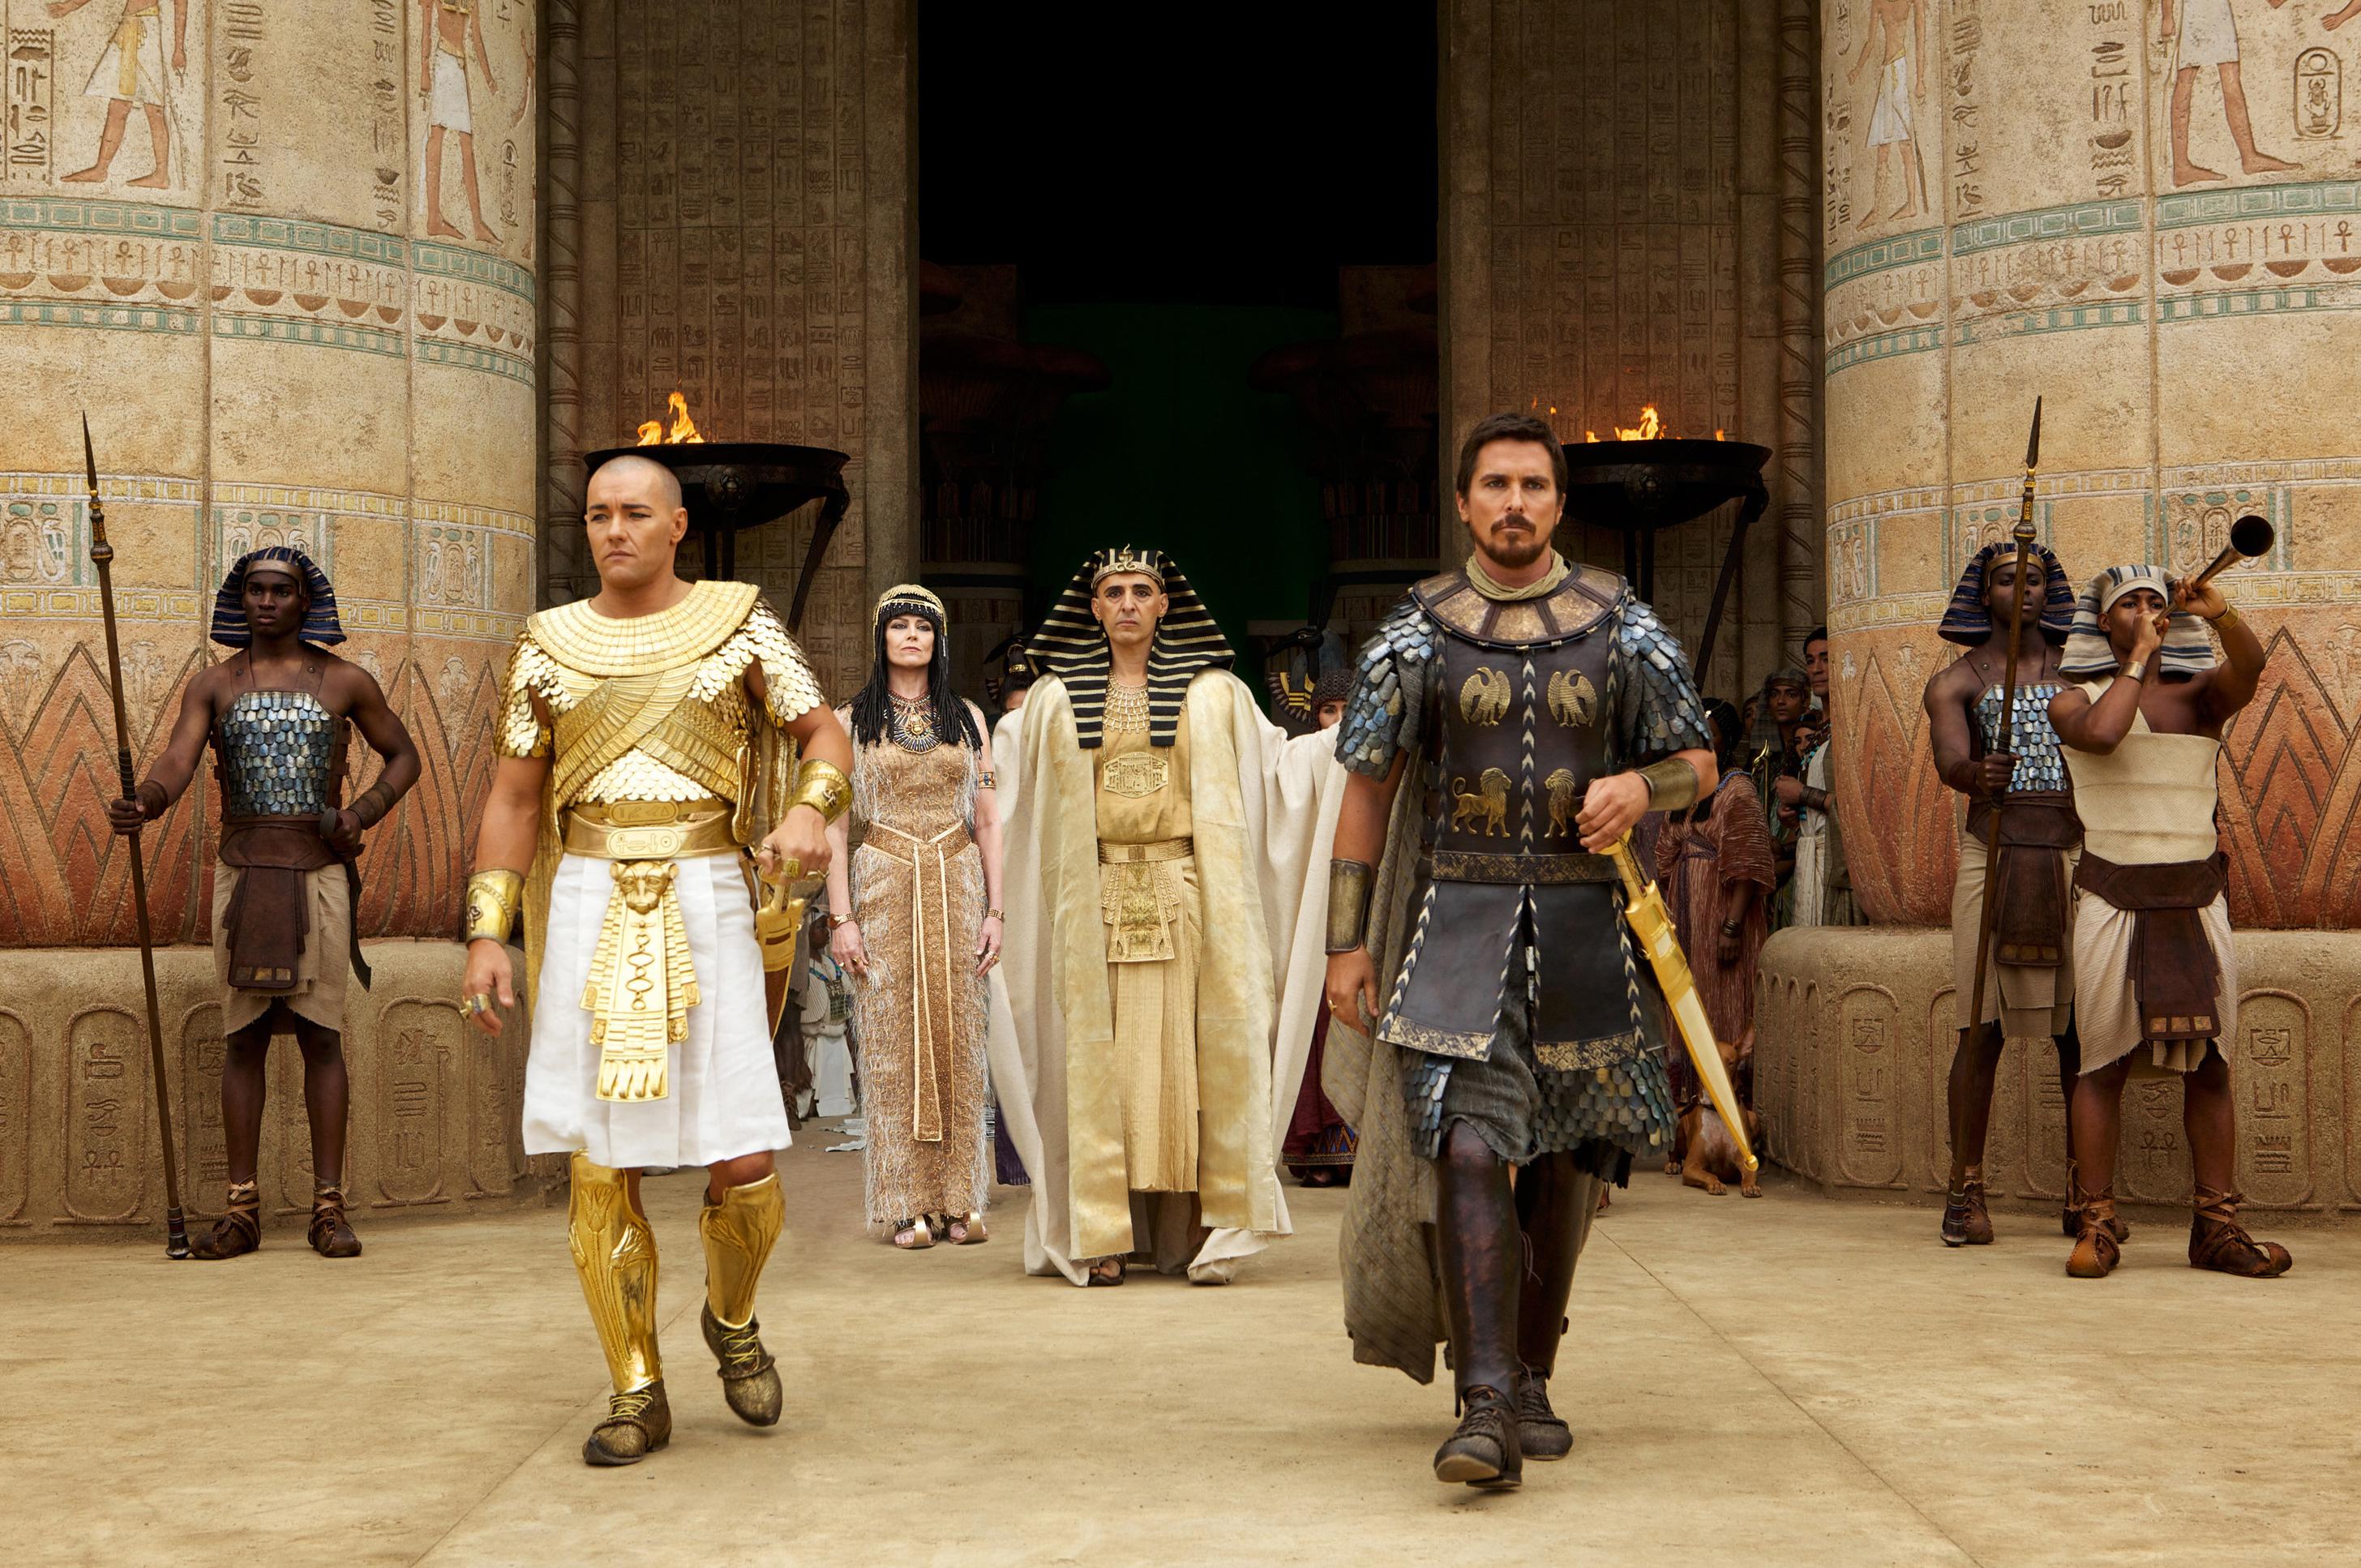 christian bale christian bale Cele mai tari filme cu Christian Bale în rol principal exodus gods and kings christian bale joel edgerton